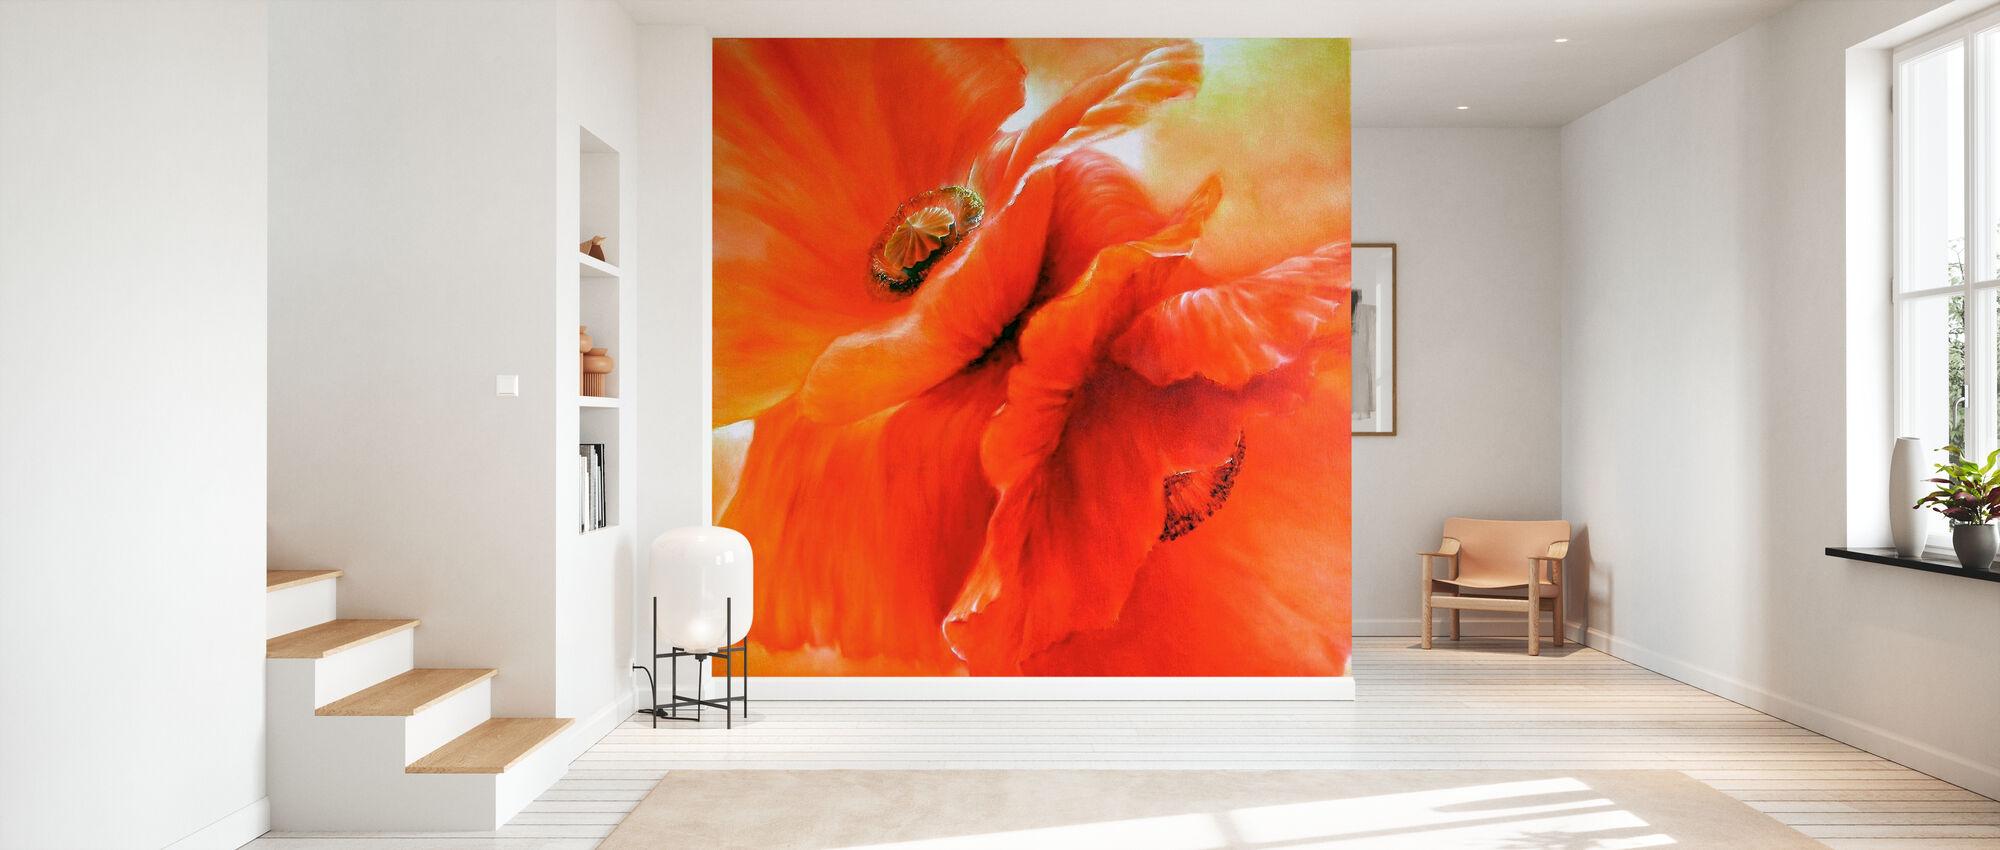 Red Poppy - Wallpaper - Hallway